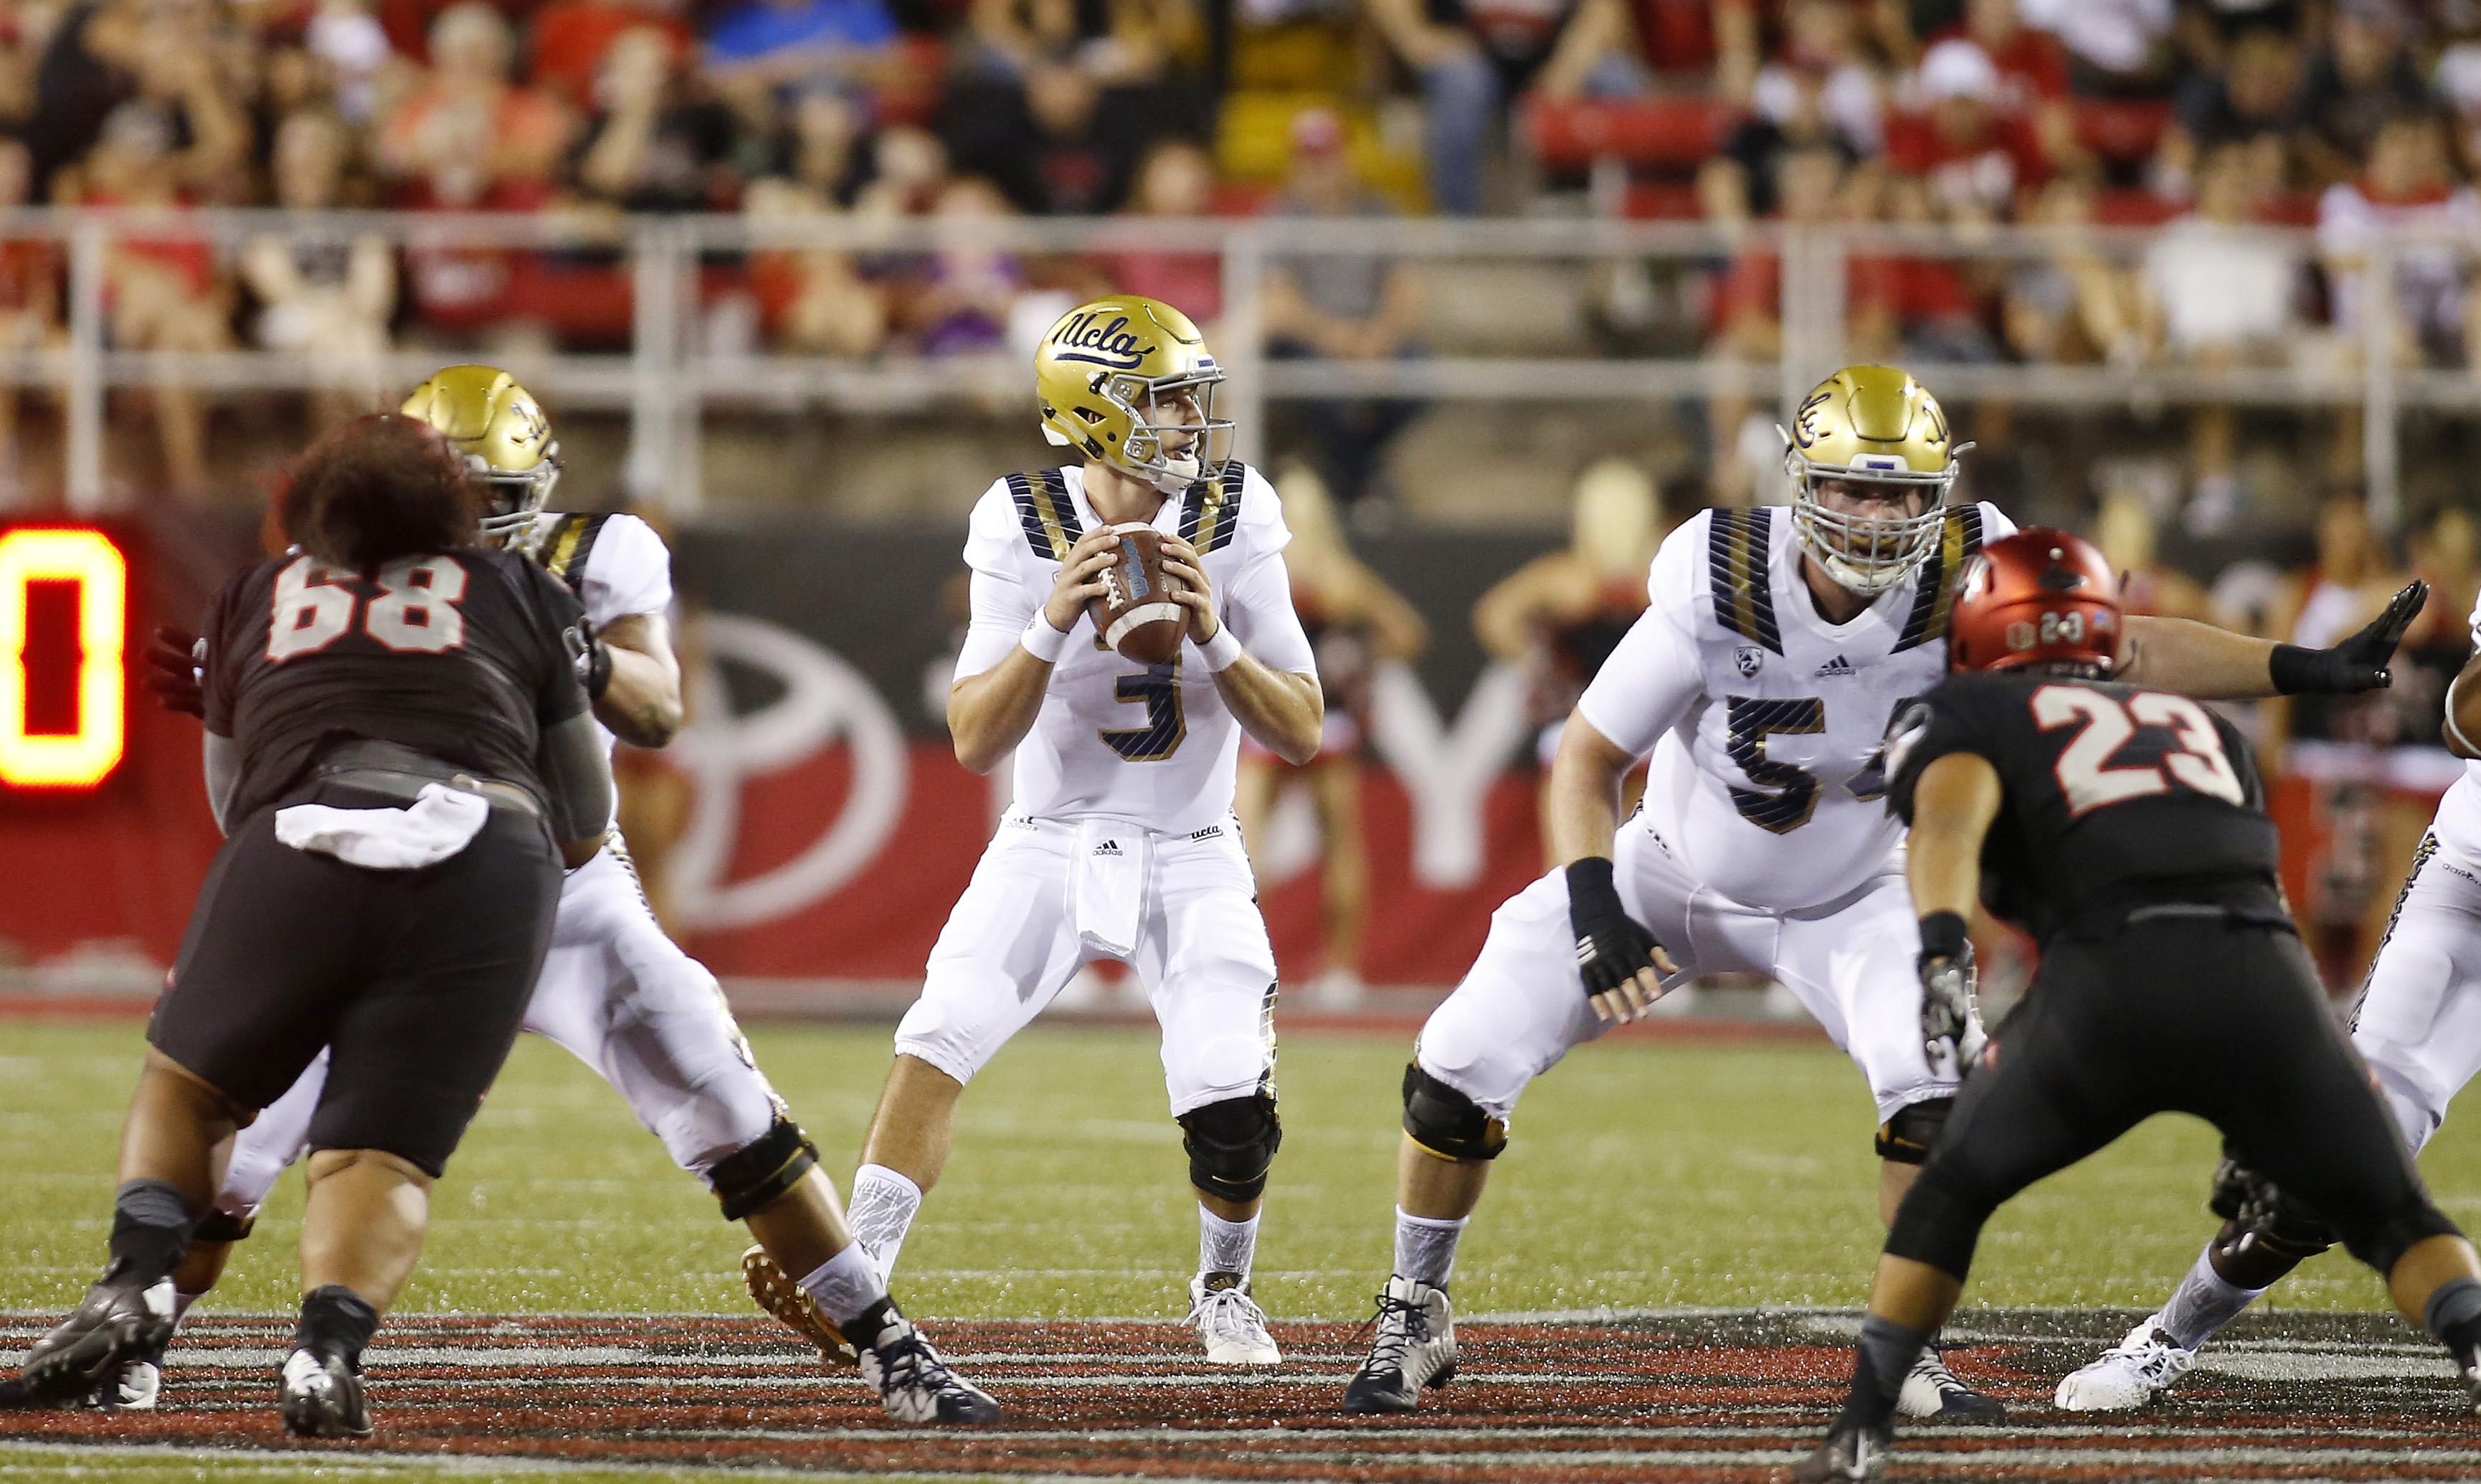 UCLA quarterback Josh Rosen drops back to pass during the first half of an NCAA football game against UNLV, Saturday, Sept. 12, 2015, in Las Vegas. (AP Photo/Isaac Brekken)